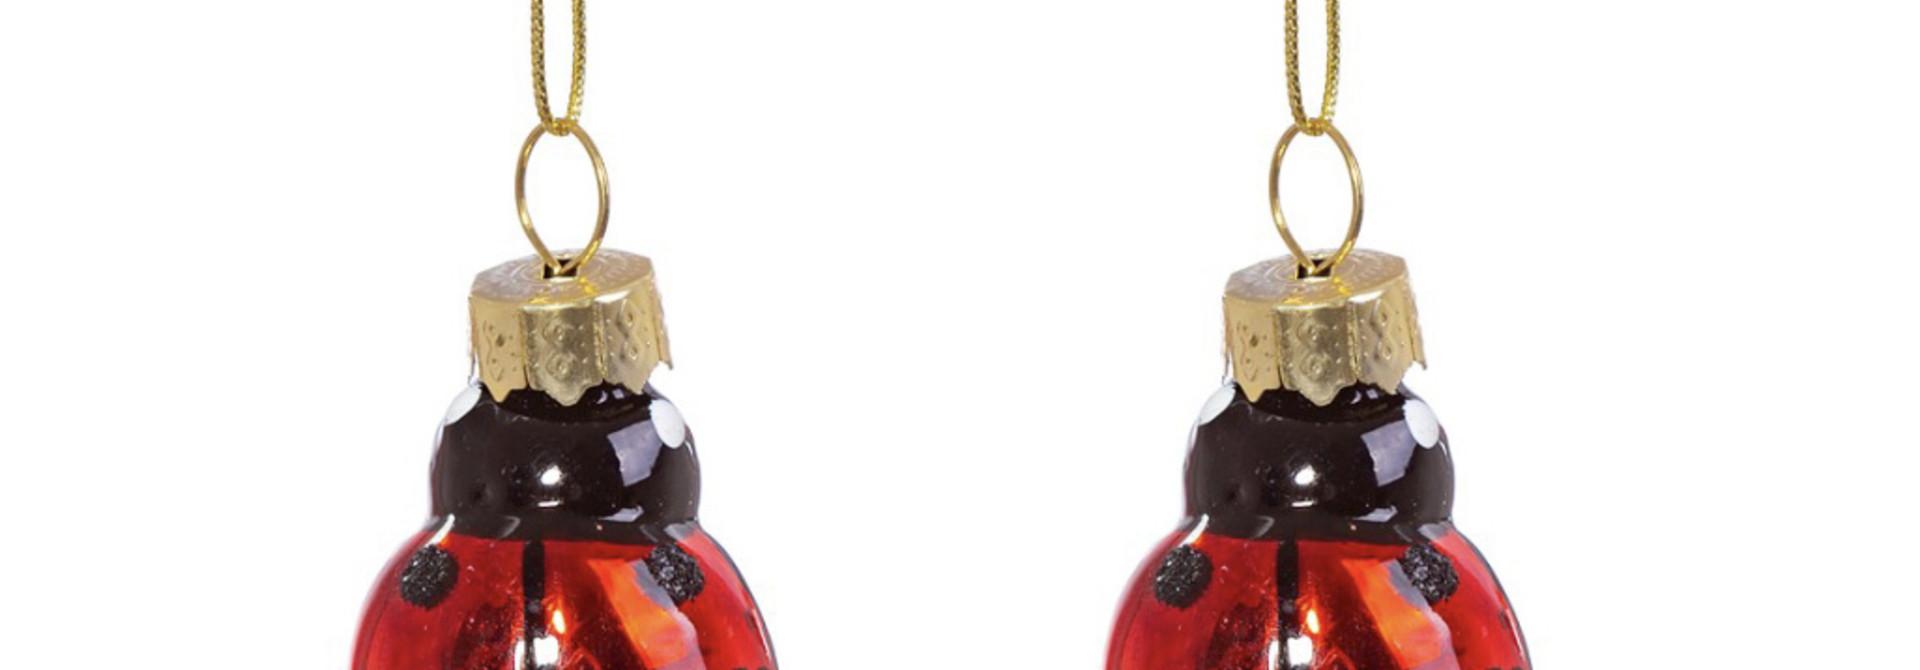 Ladybird shaped mini baubles - set of 2